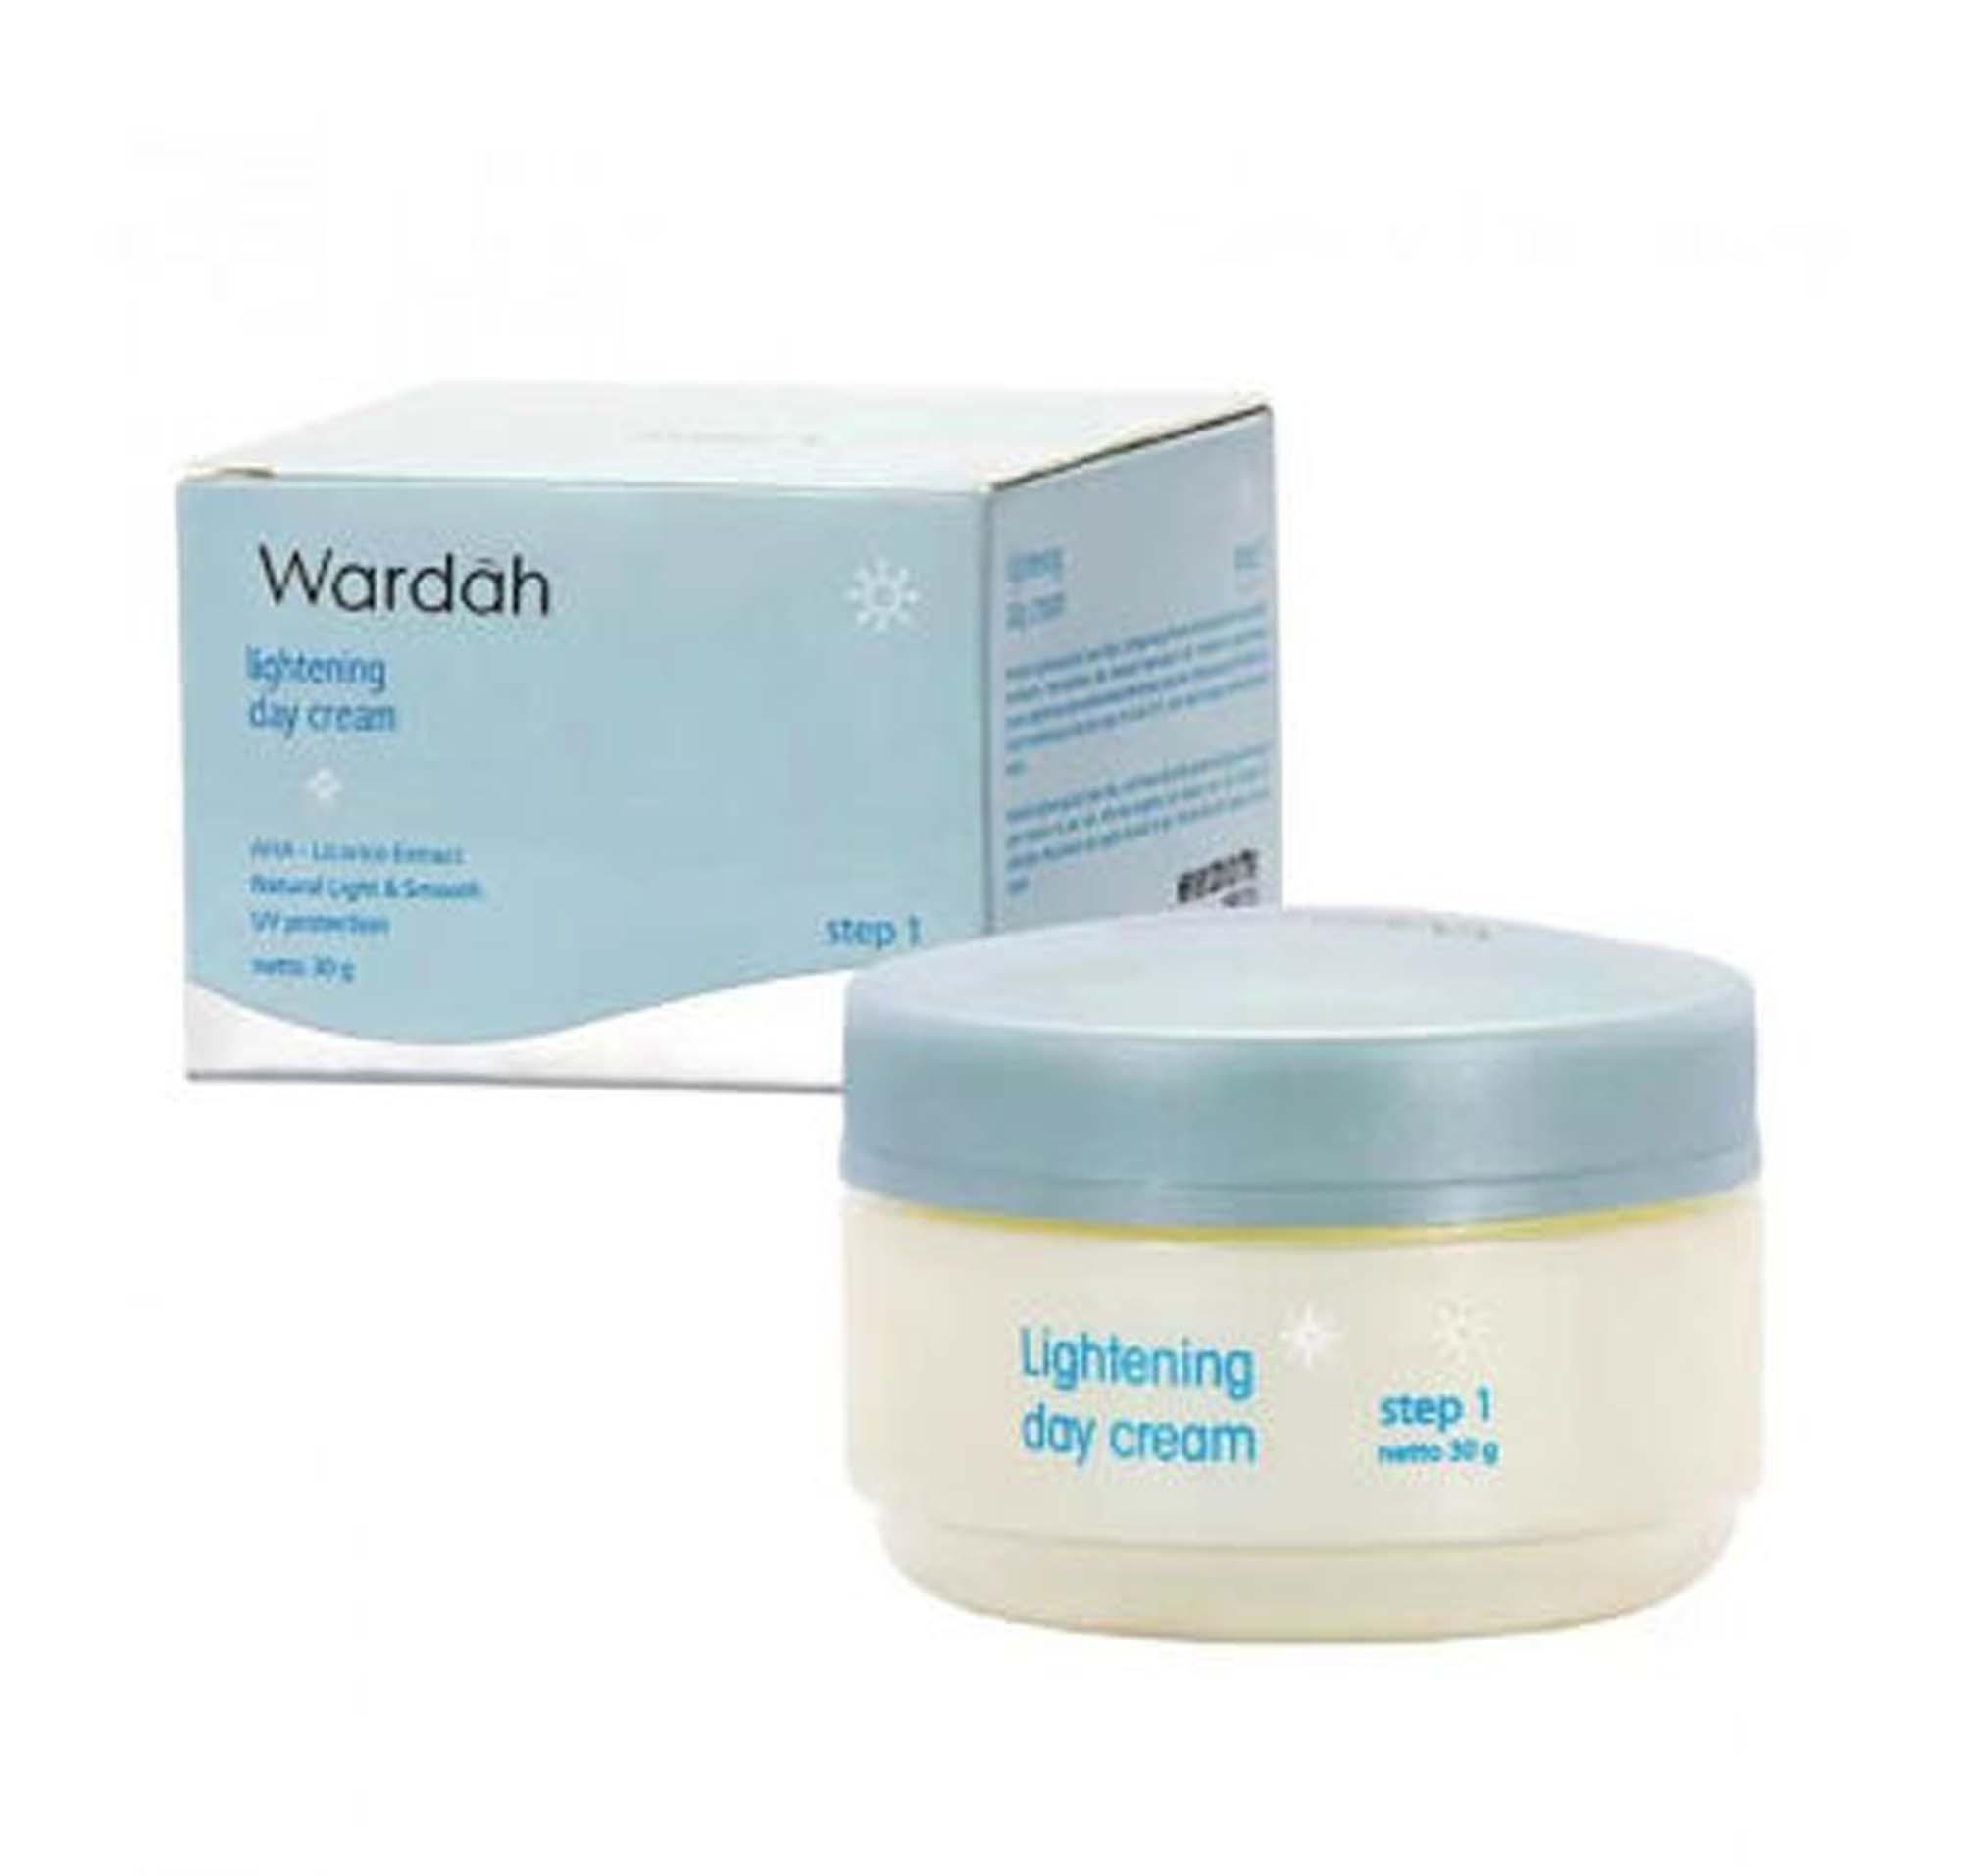 Harga Wardah Lightening Night Cream Step 1 20 Ml Rp 41500 Day 30 Gram